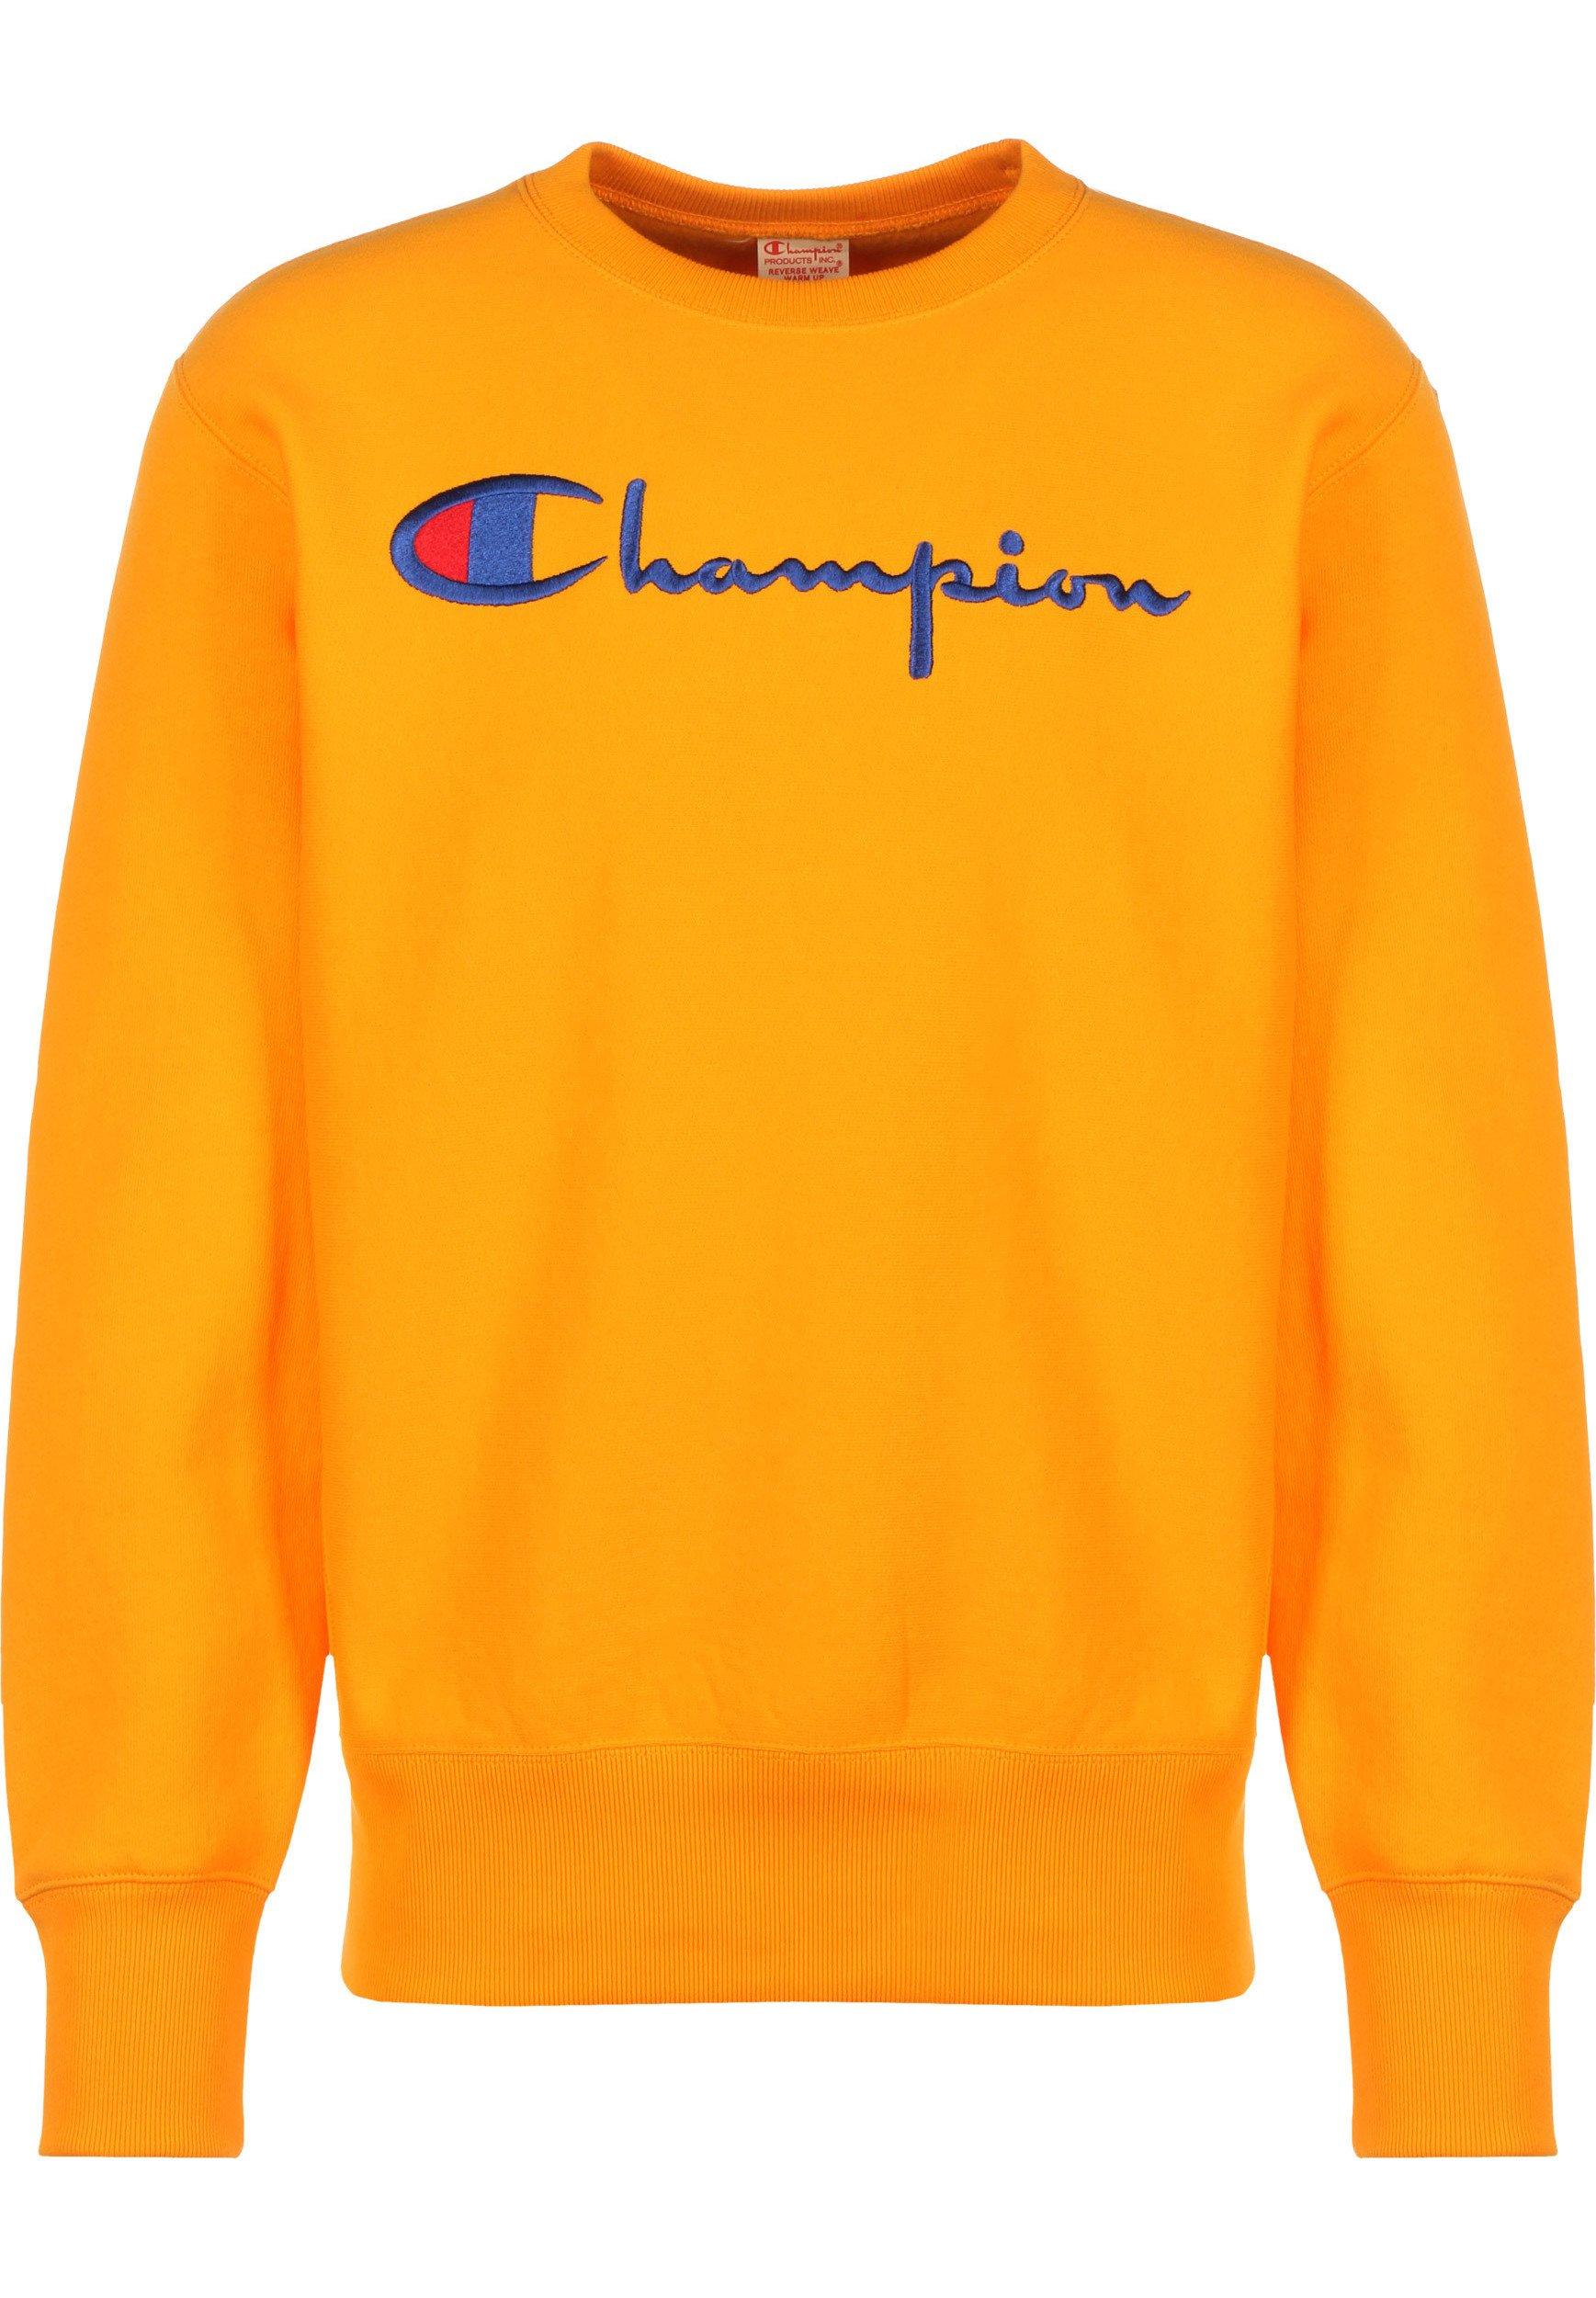 Champion Reverse Weave Crewneck - Sweatshirt Olive